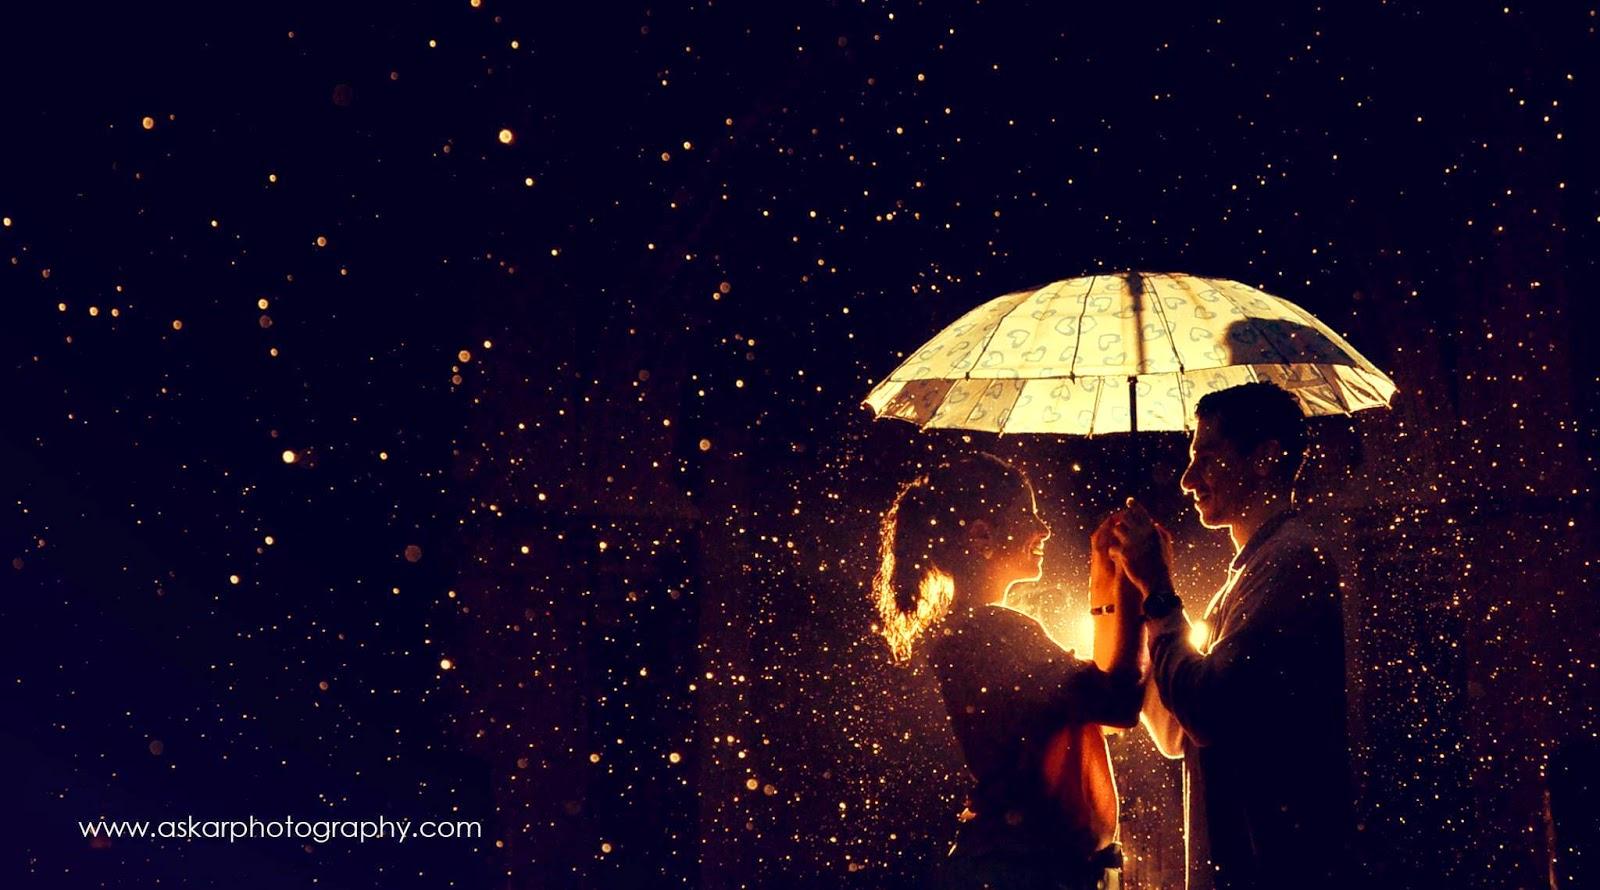 paket foto prewedding murah, jasa foto prewed, poto nikahan, poto wedding, foto murah,